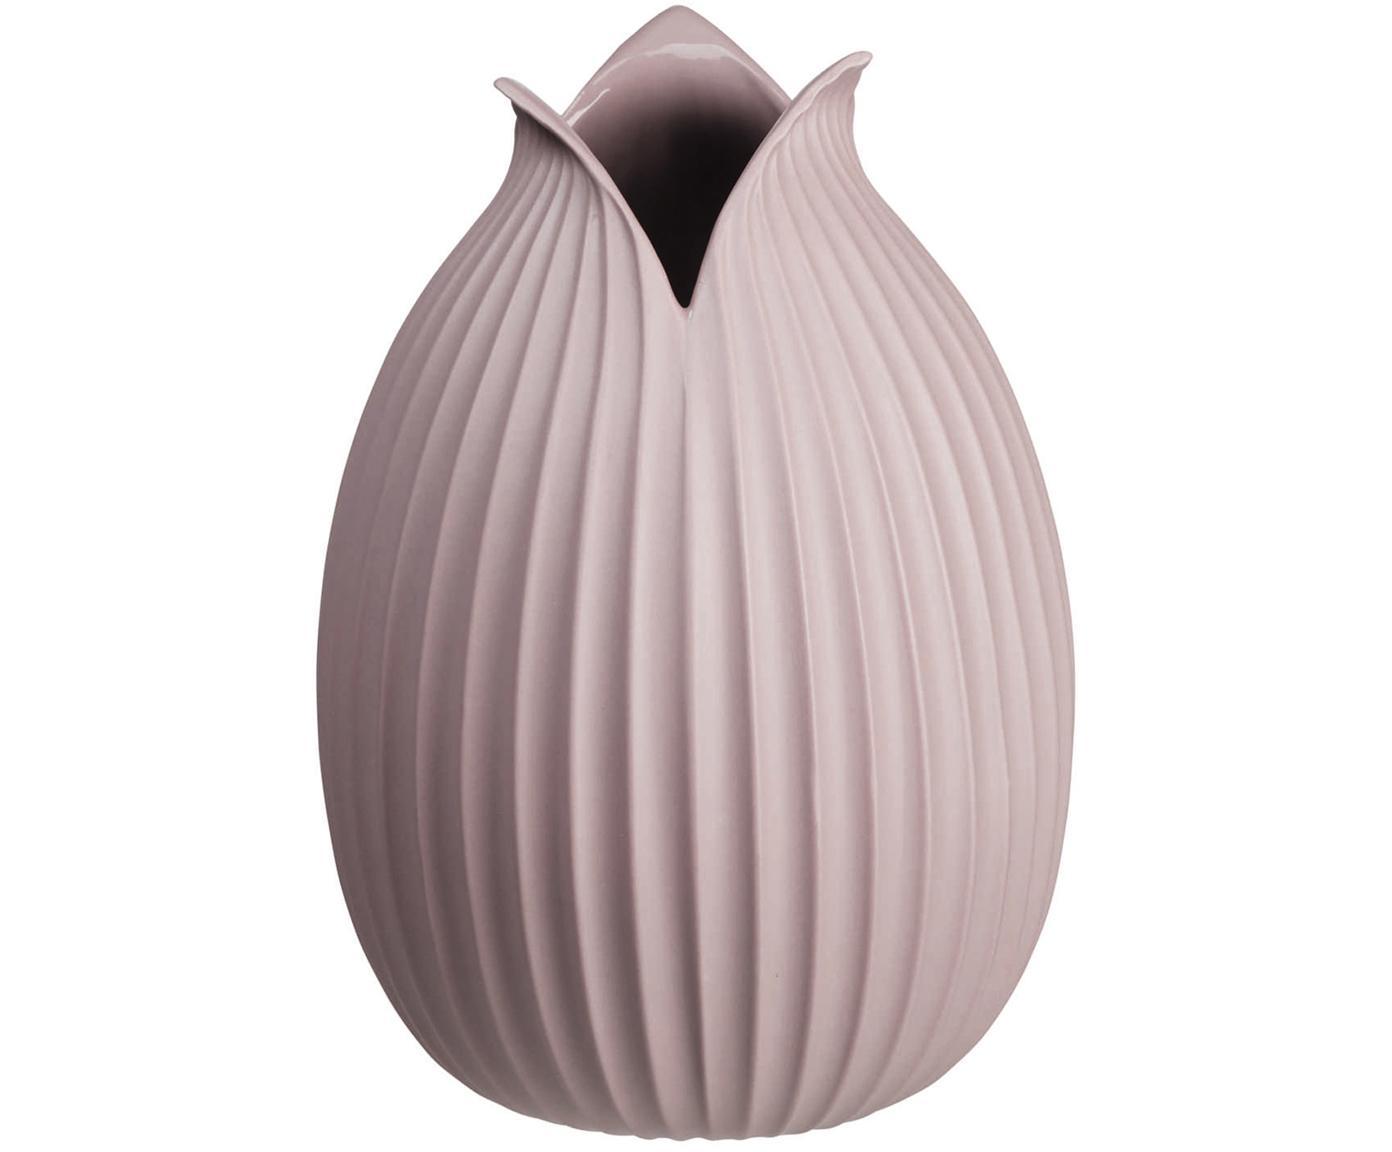 Vaso in porcellana fatto a mano Yoko, Porcellana, Rosa, Ø 19 x Alt. 18 cm